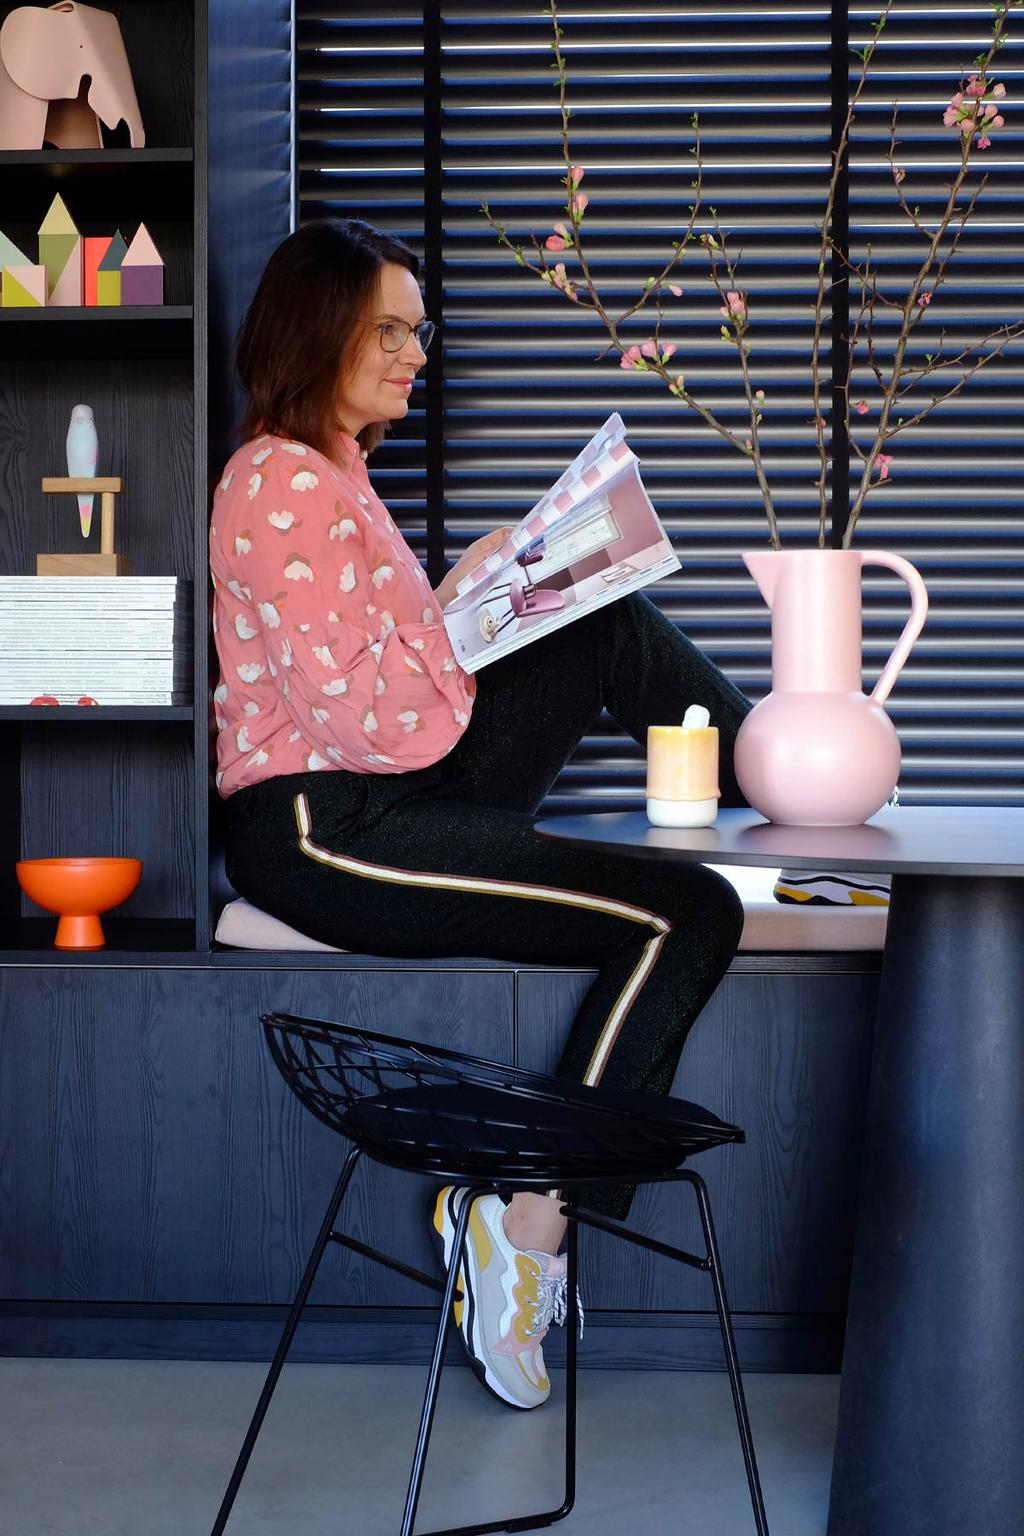 Zwart interieur met roze vaas Blogger PRCHTG